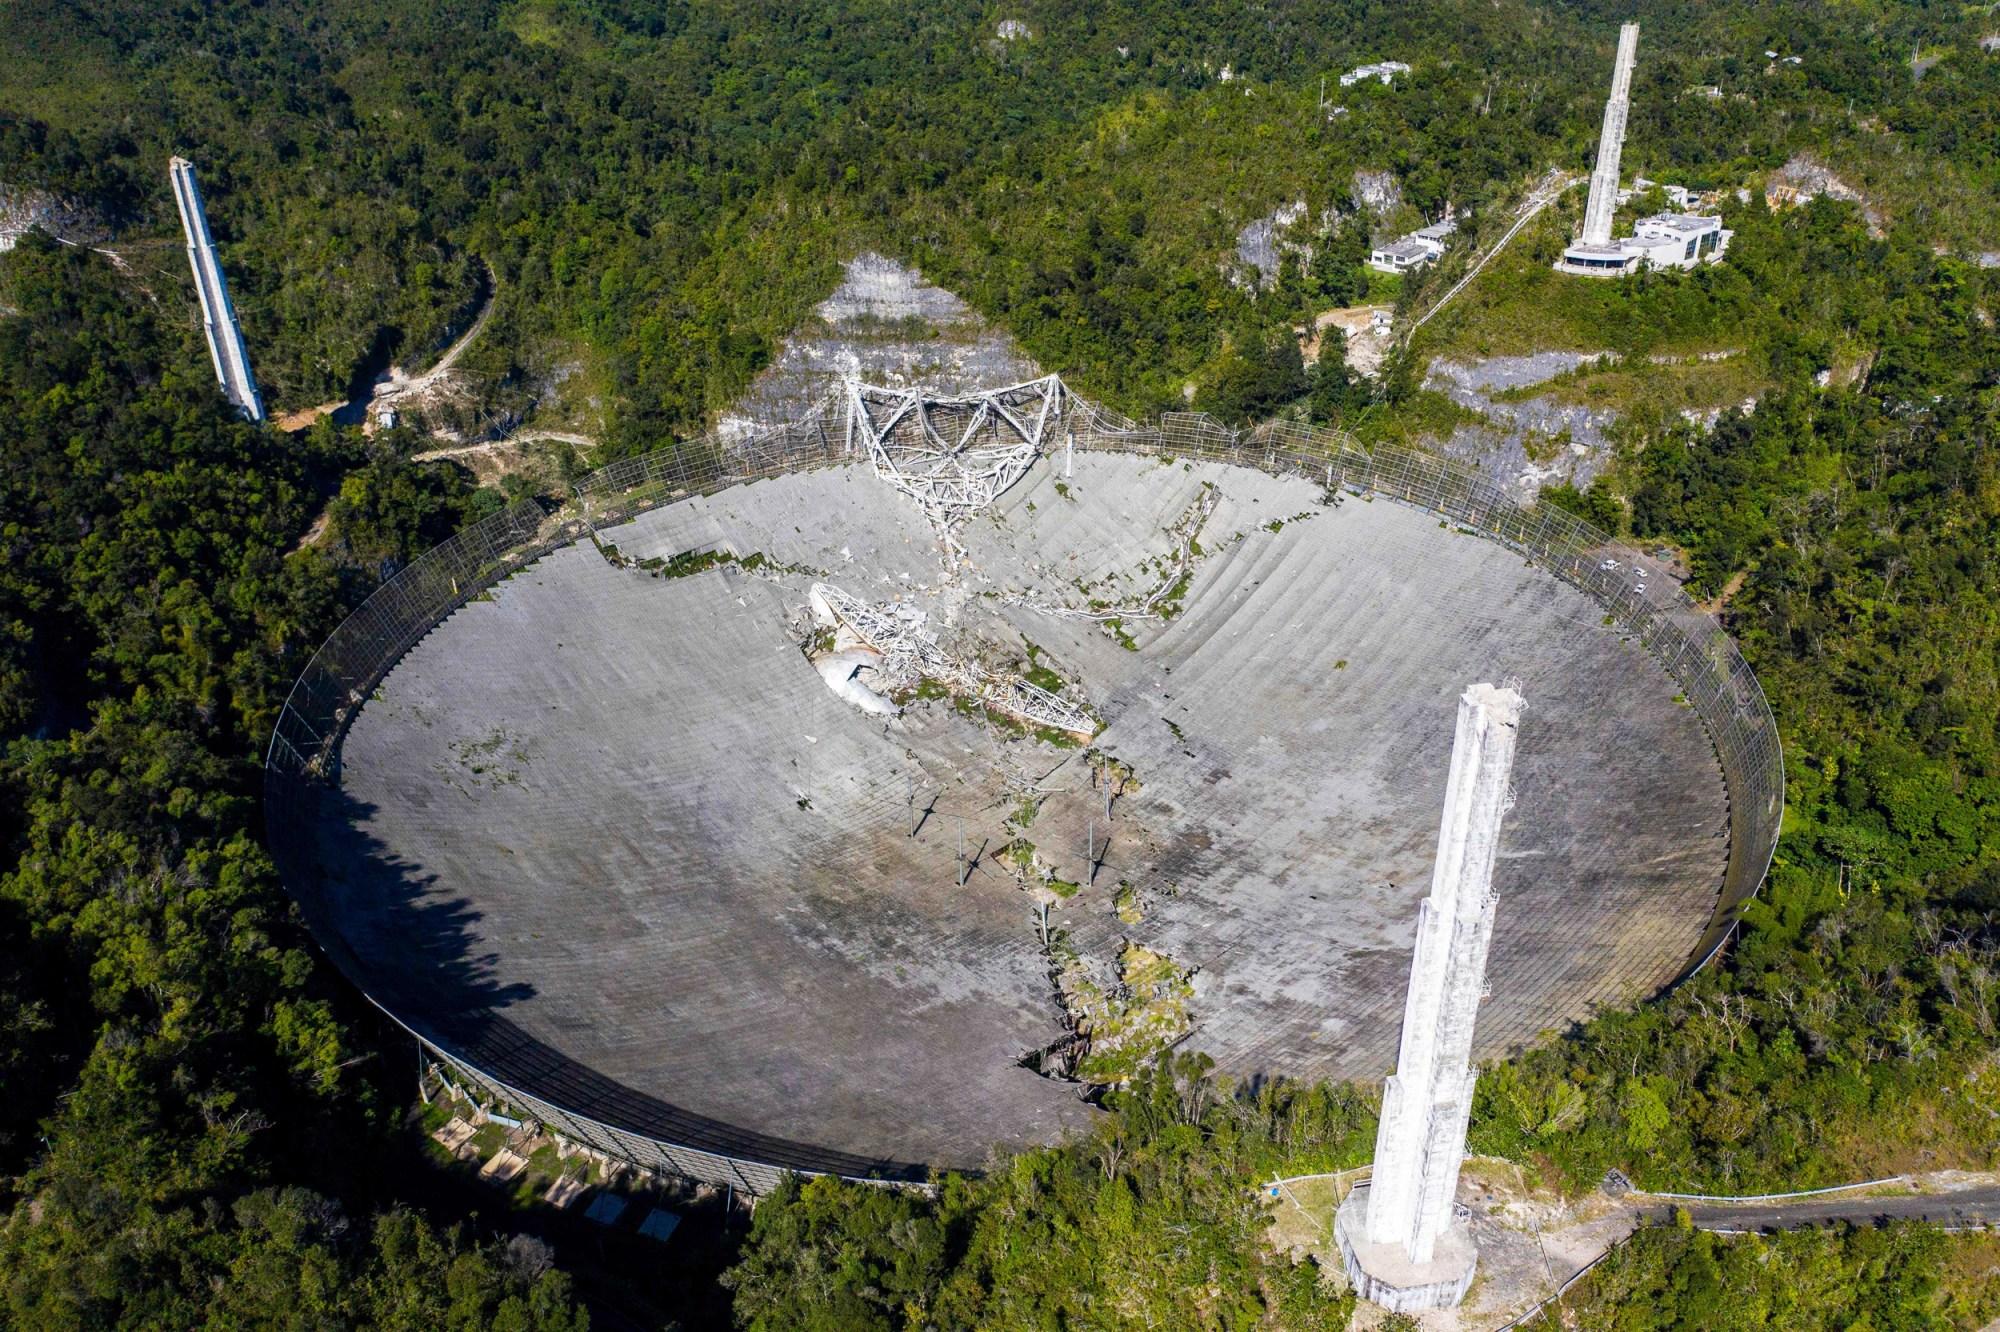 201201-arecibo-observatory-jm-1250_e89624ef19ae1f99f63320560f64a56e.fit-2000w.jpg